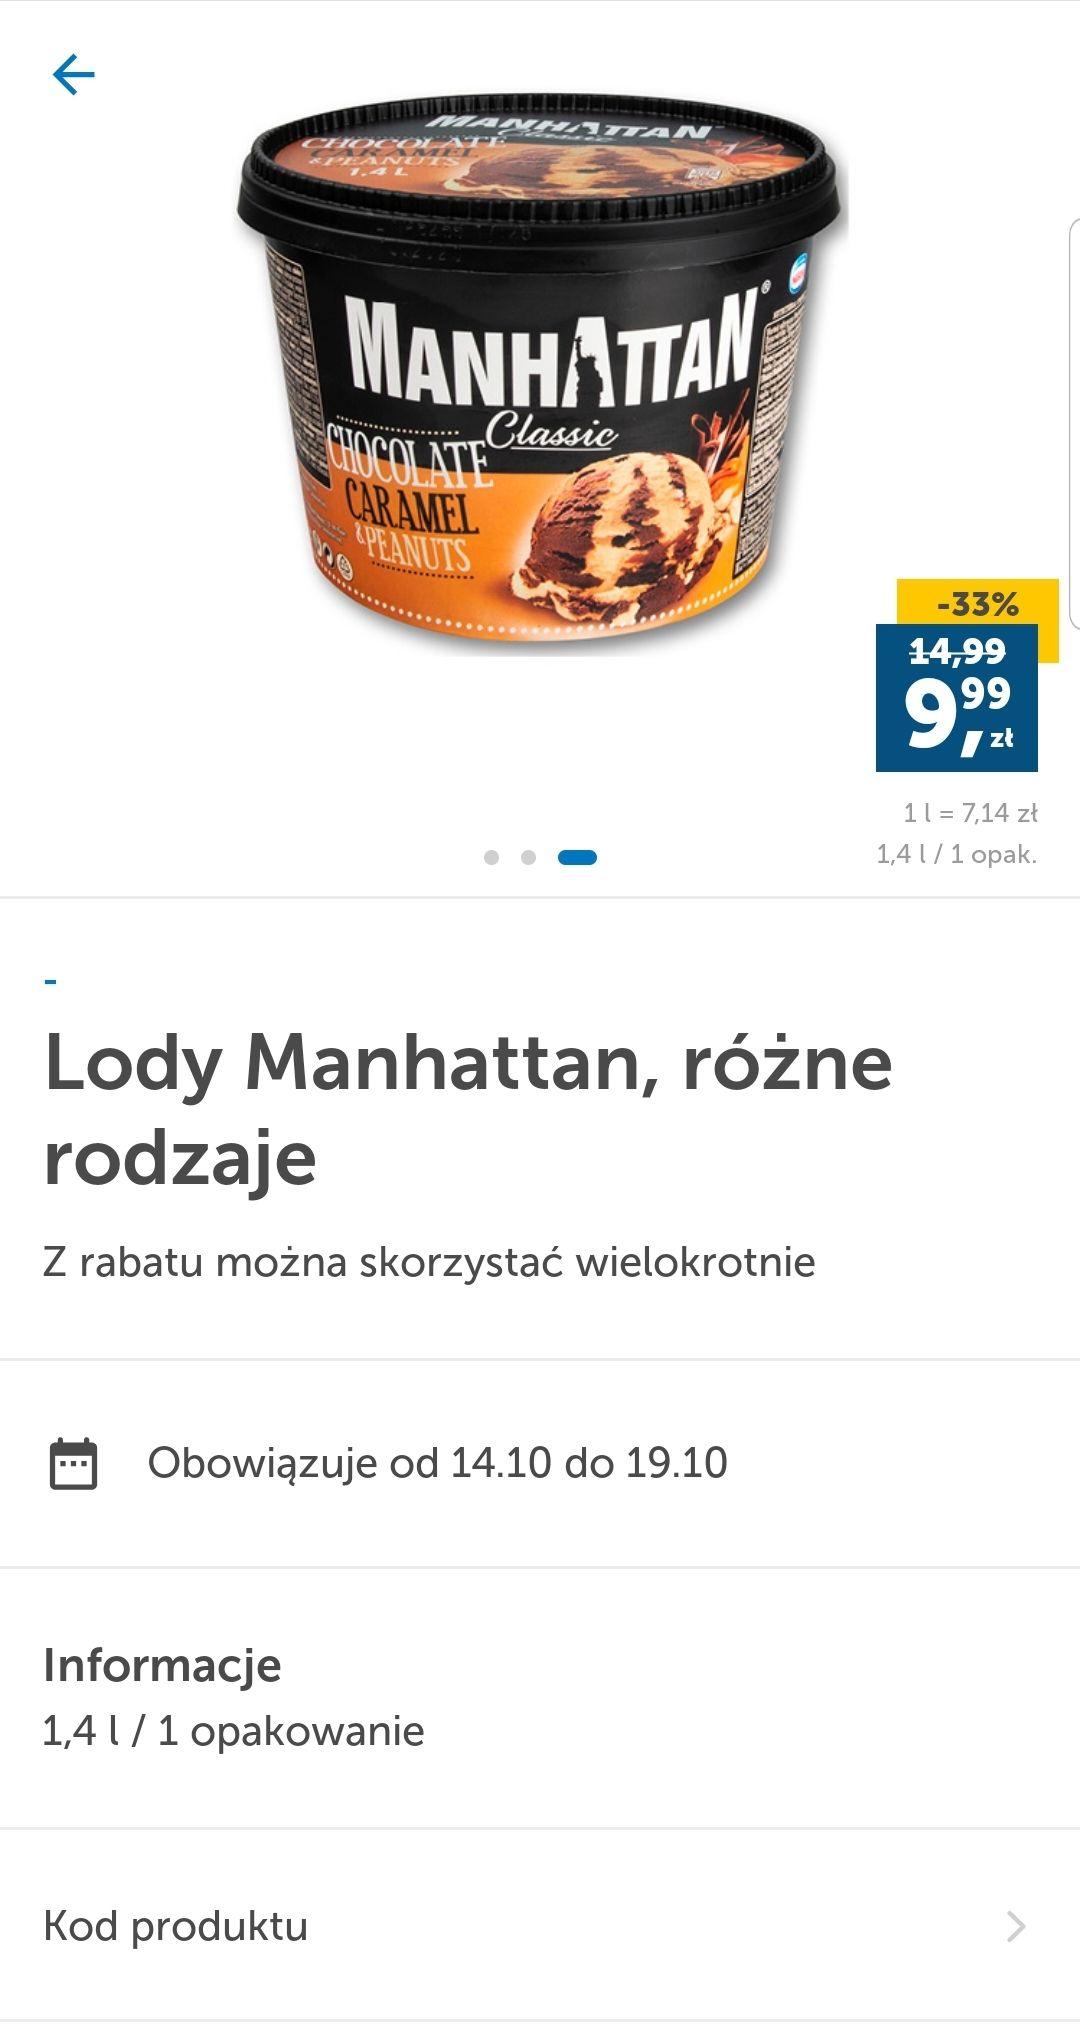 Lody Manhattan 1.4 litra. Lidl Plus